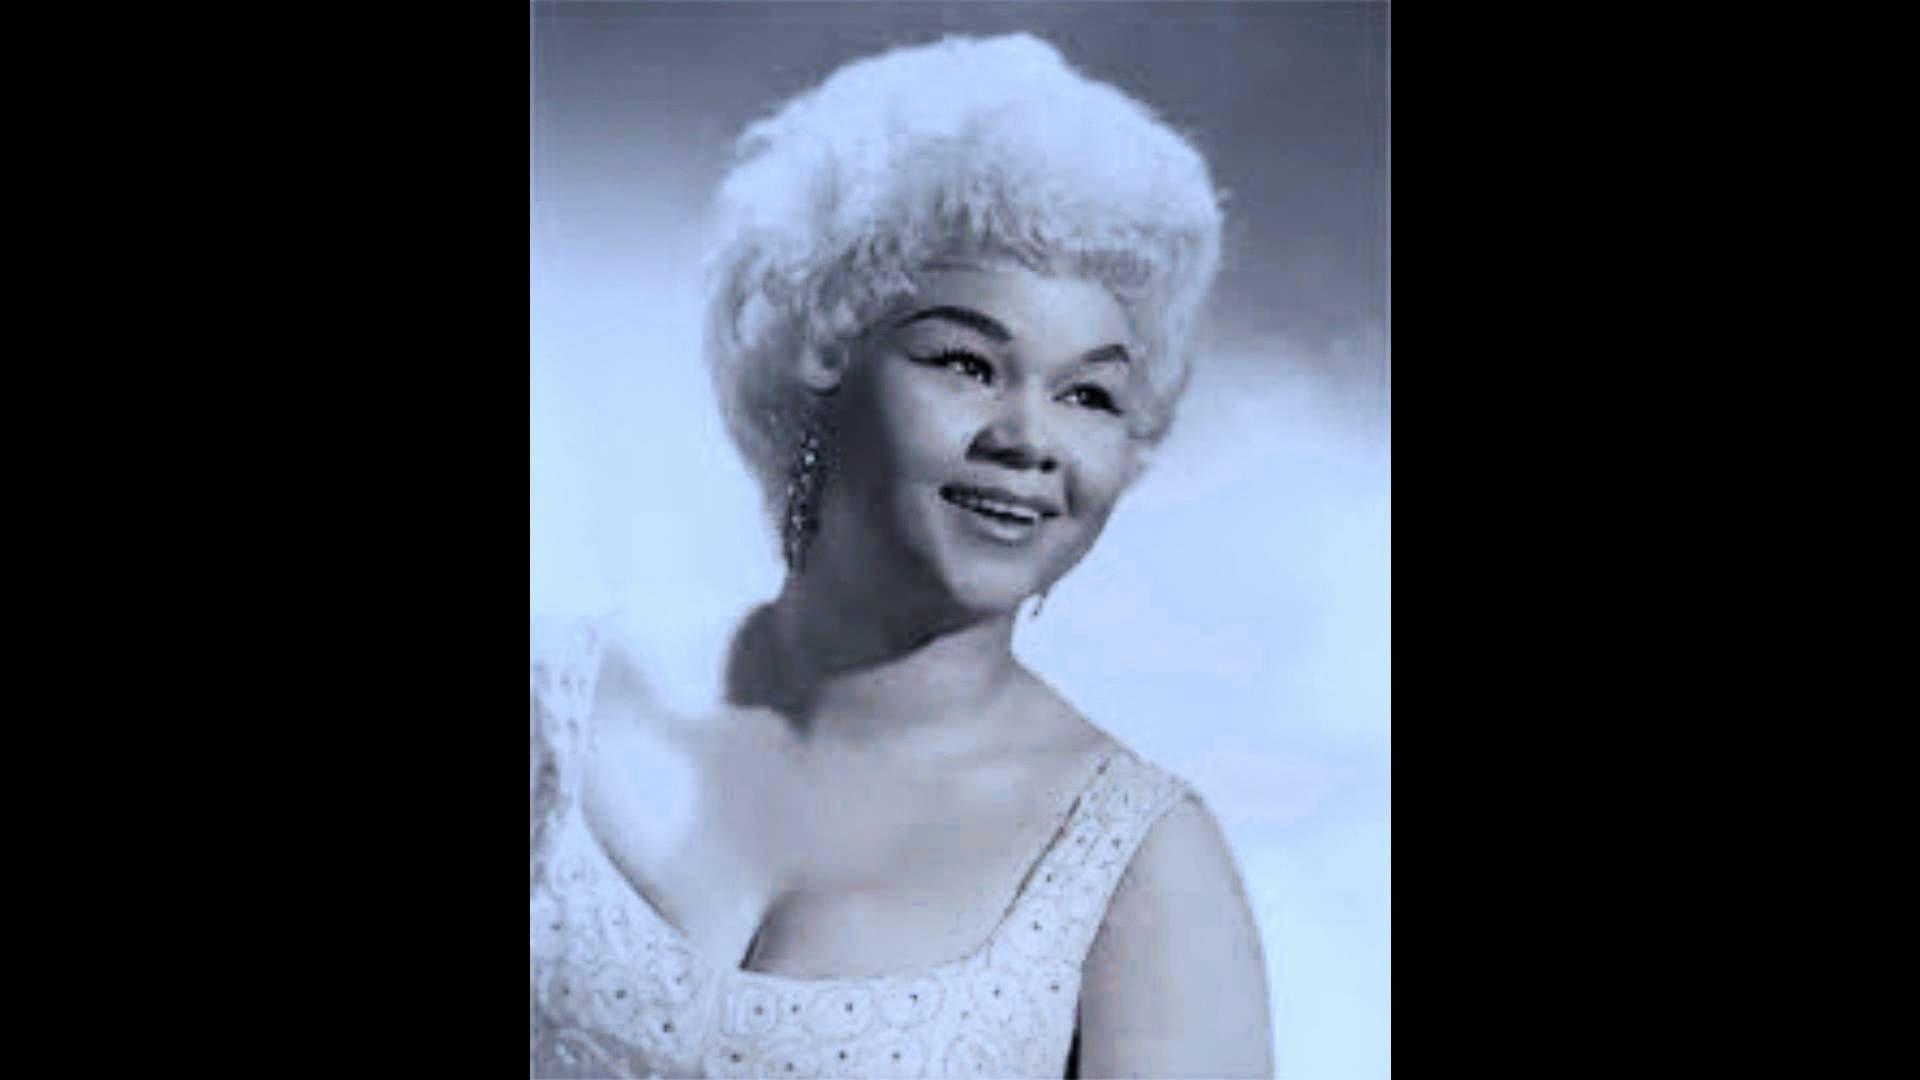 At Last Sheet Music Etta James - FREE SHEET MUSIC PDF